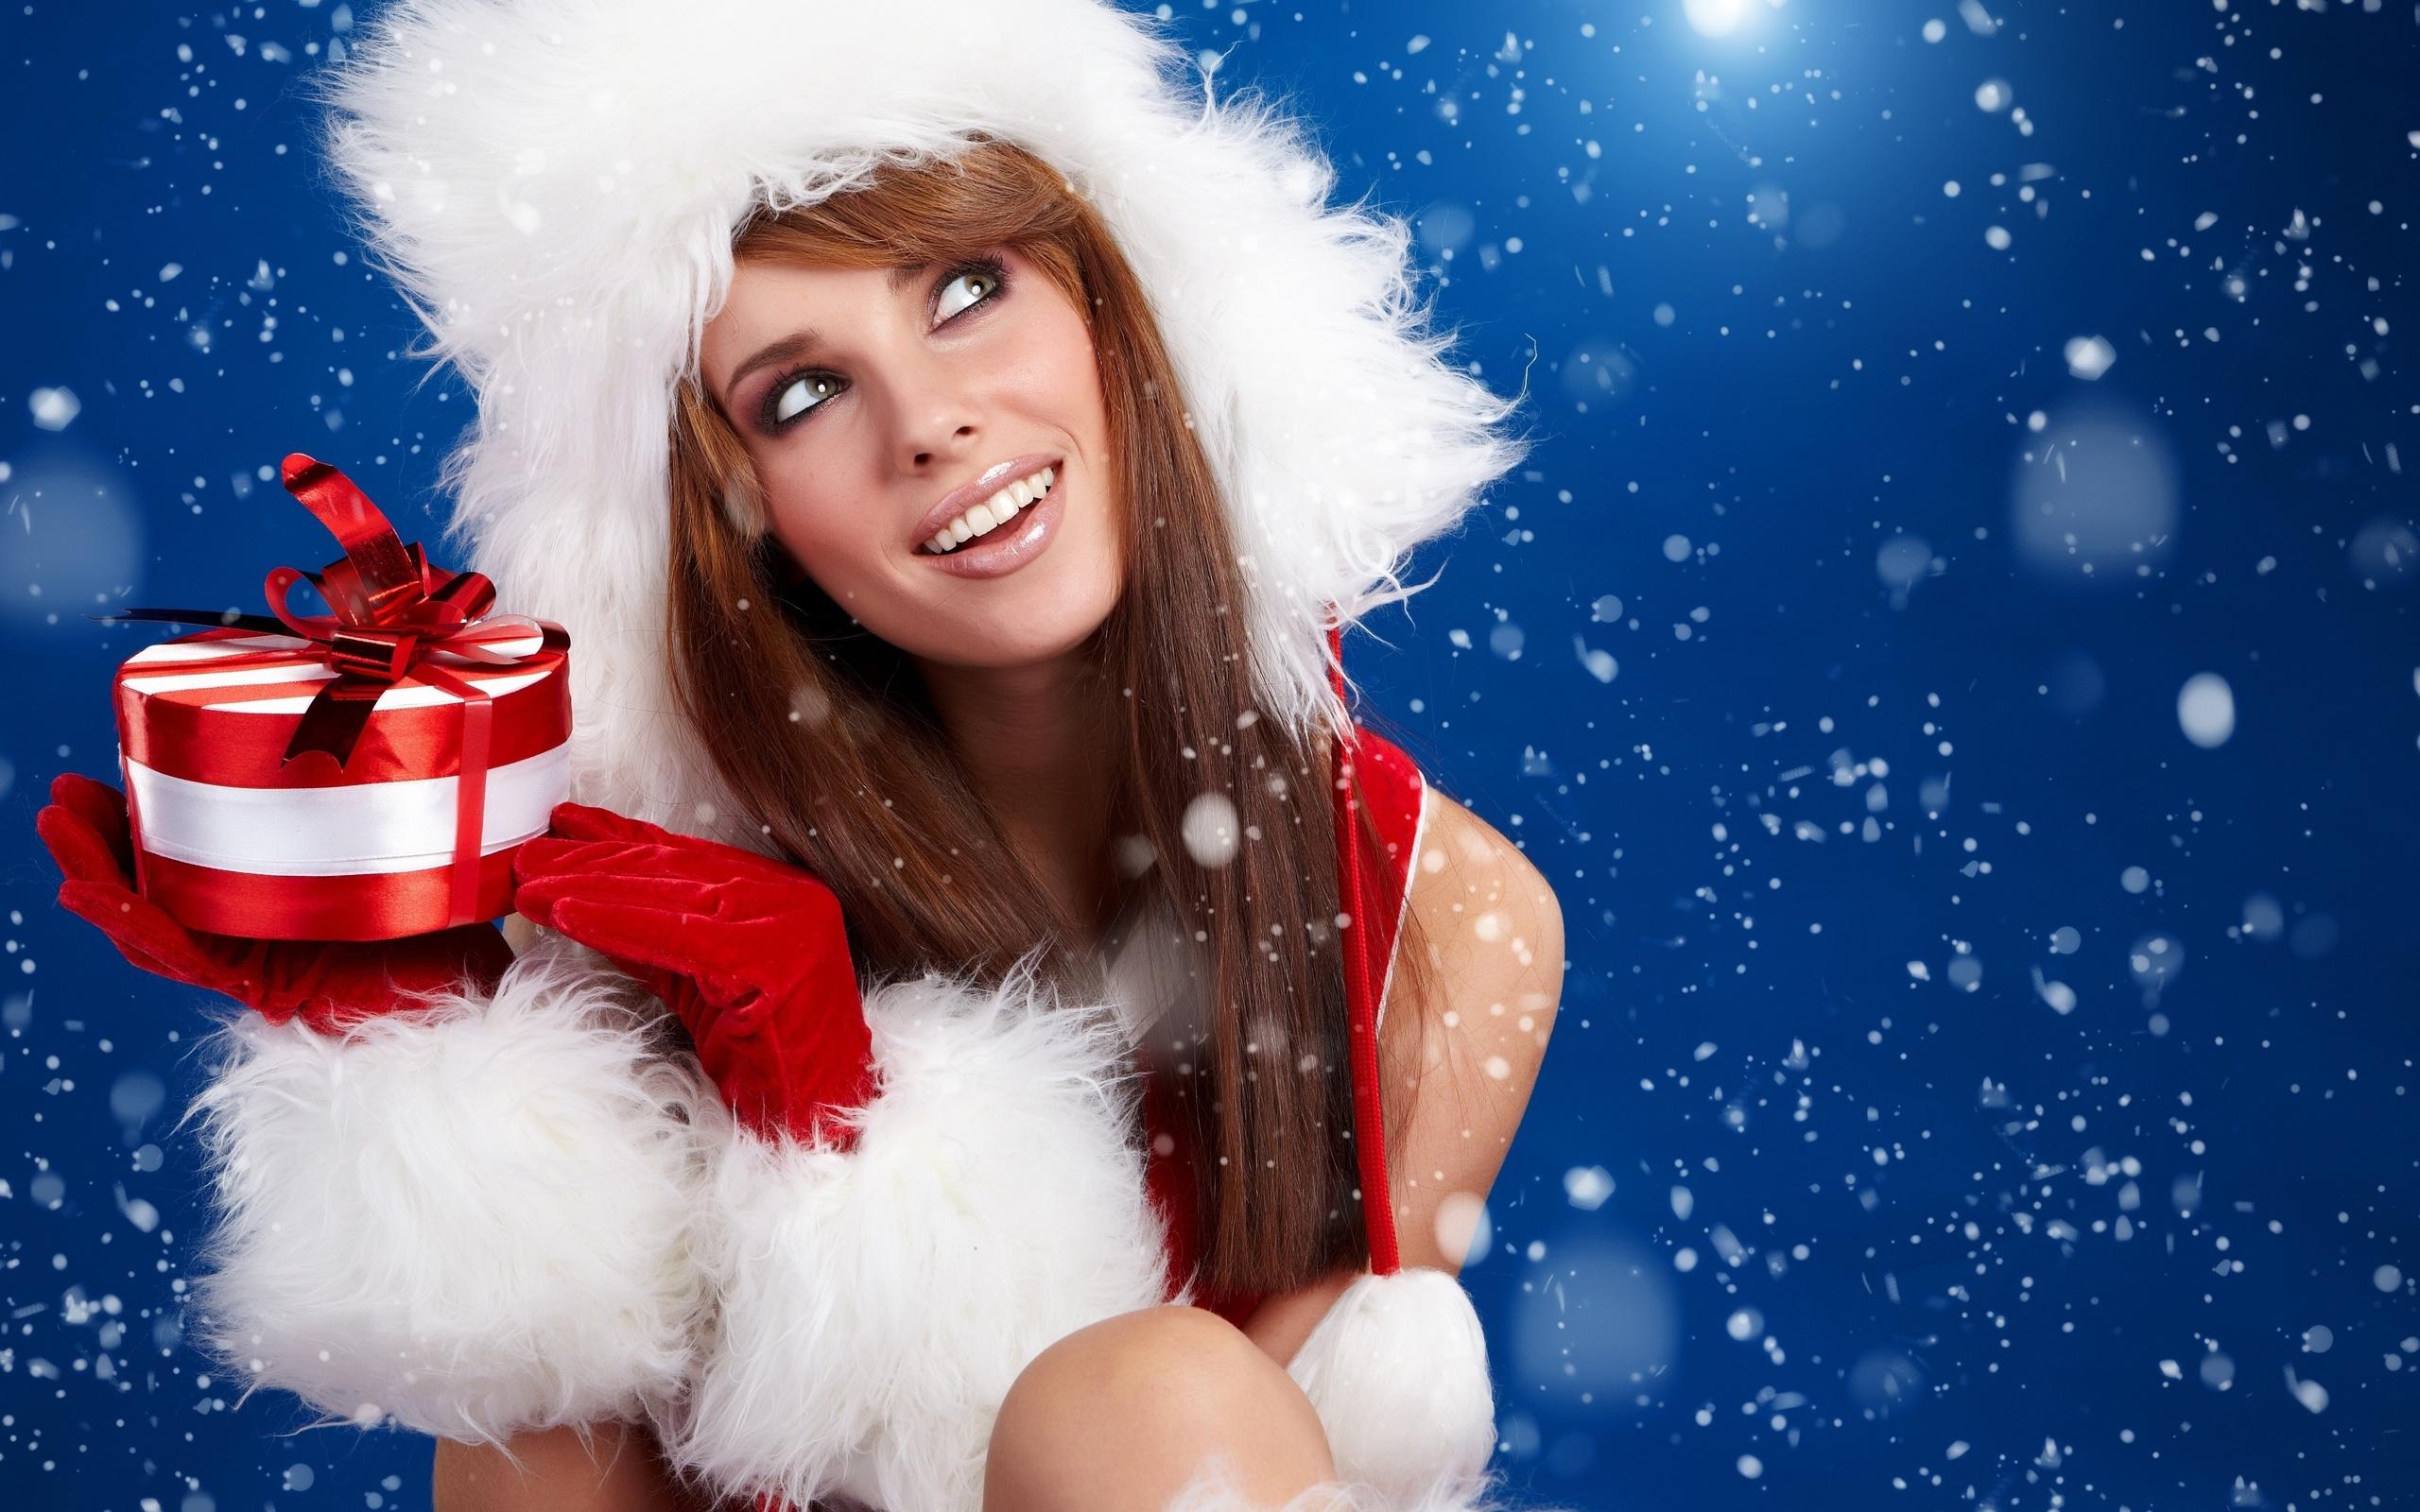 Фото жена снегурочка 11 фотография